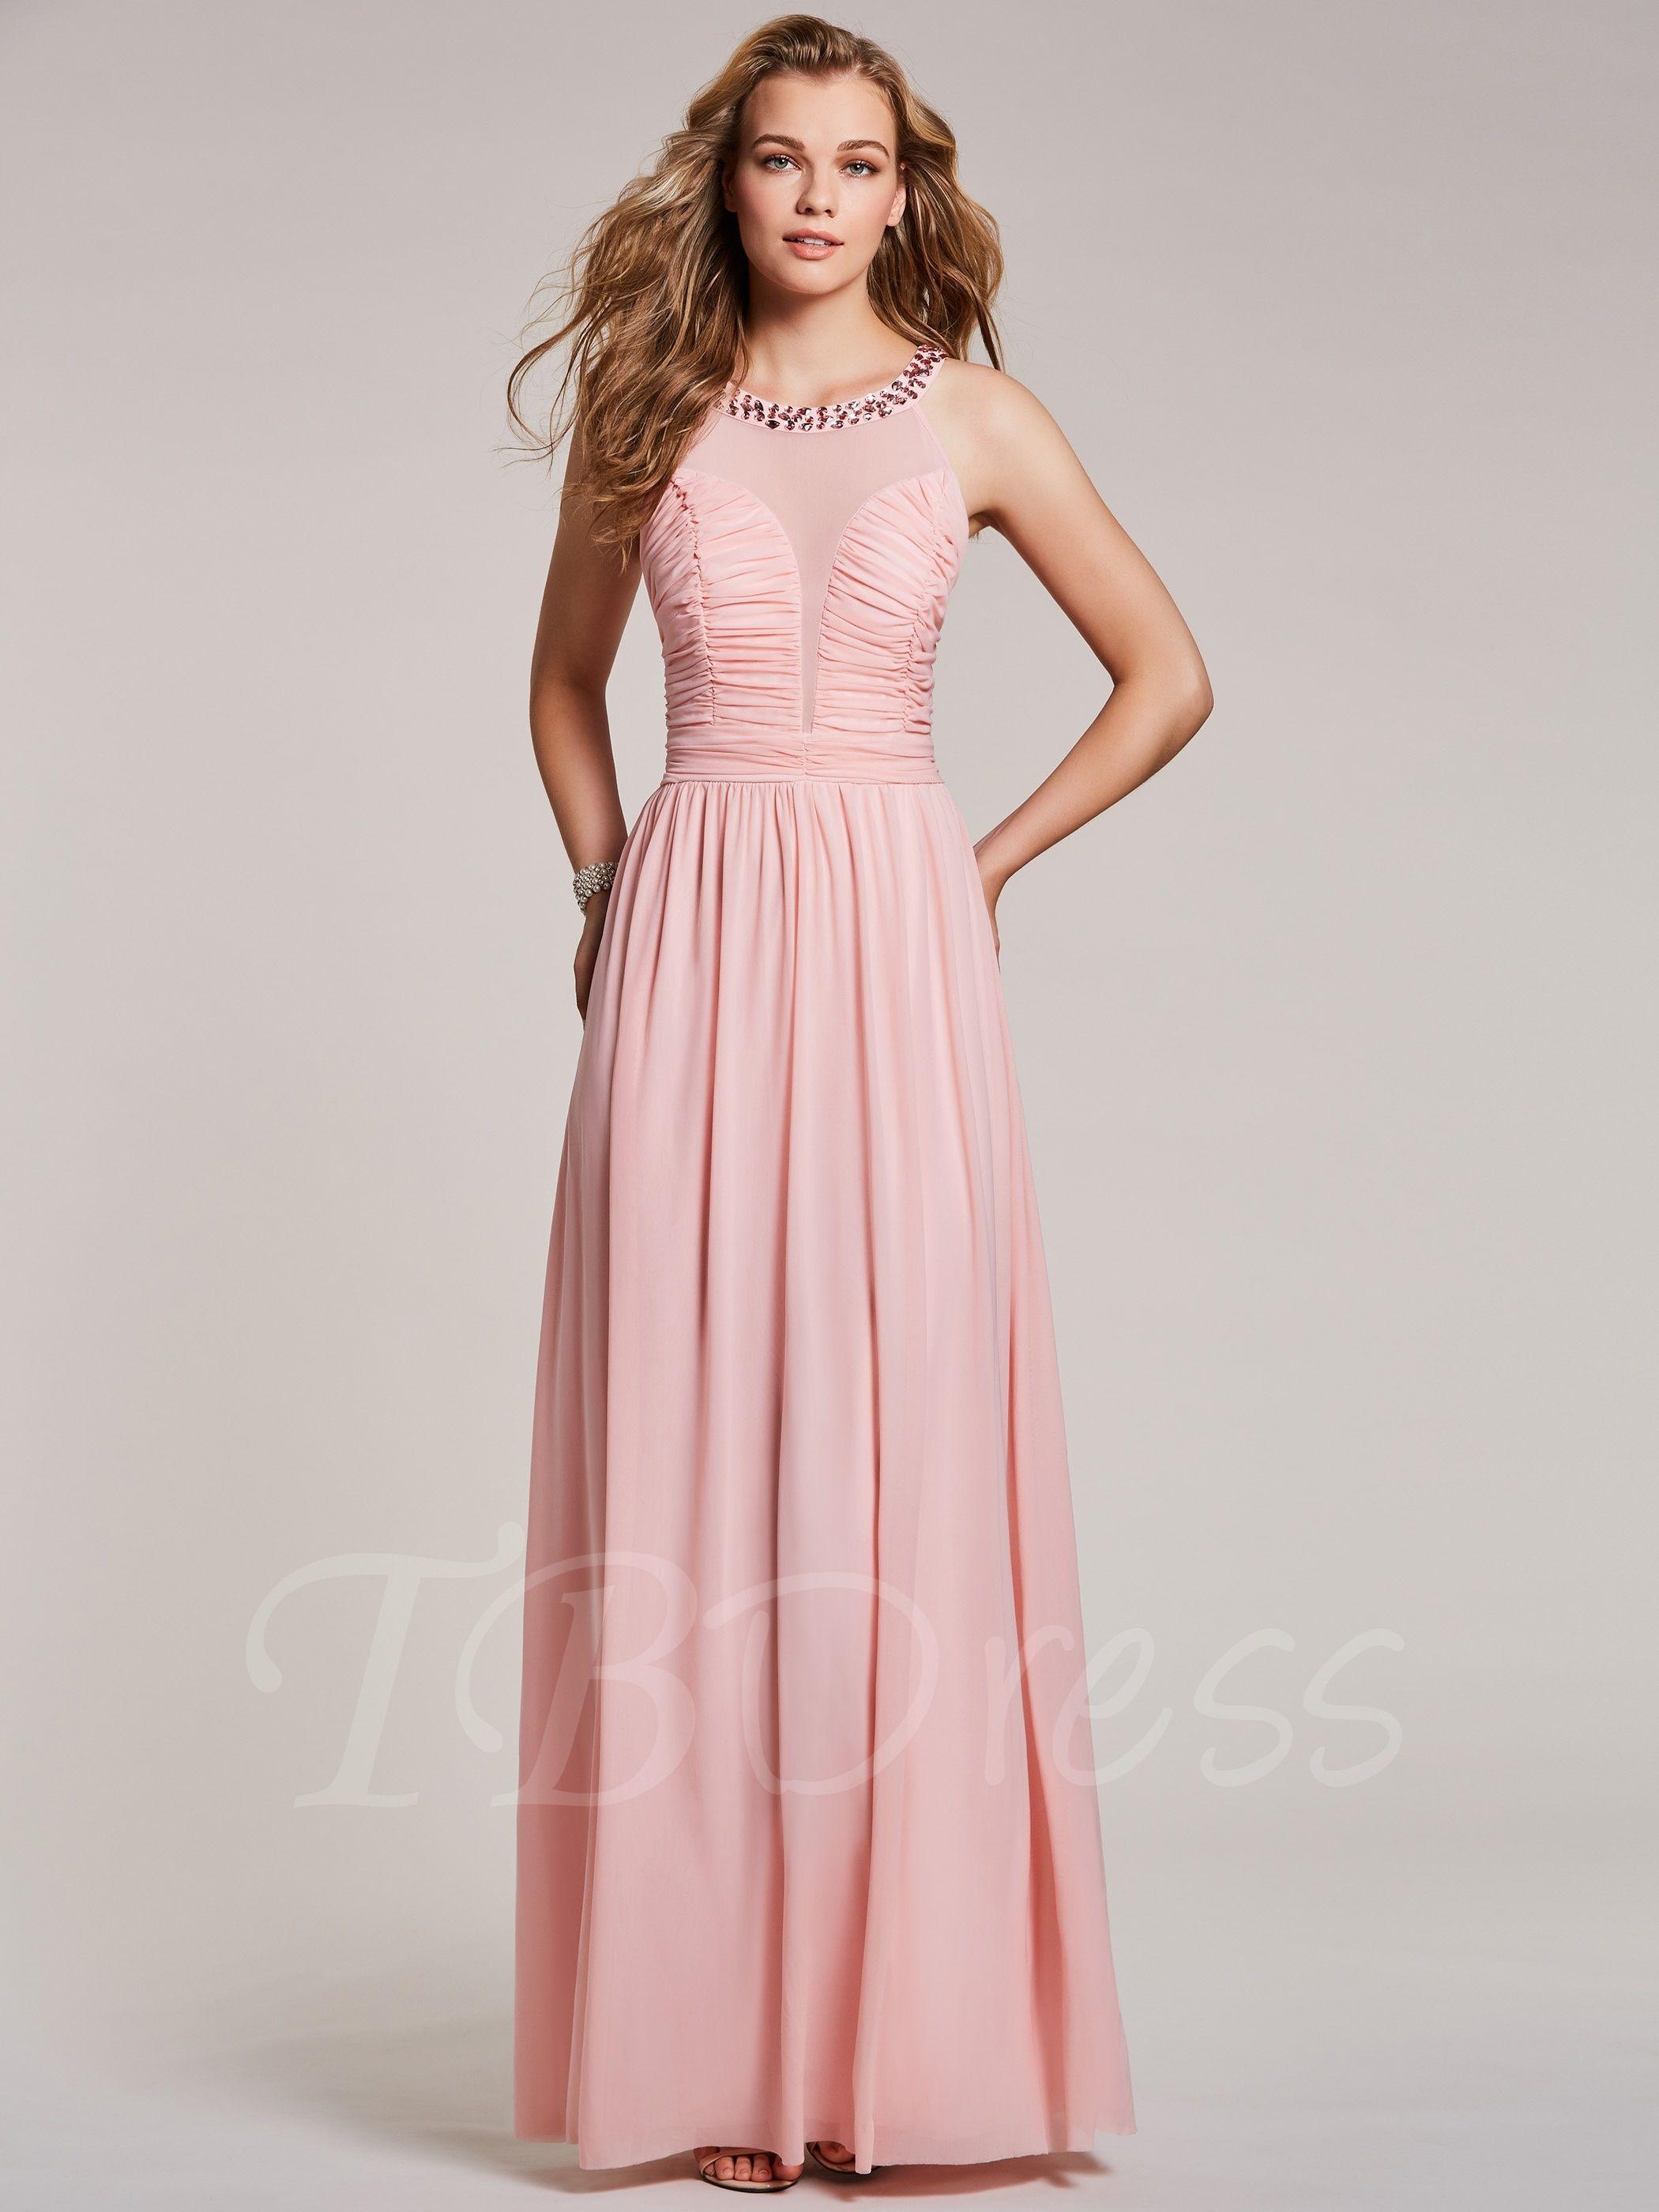 Tbdress.com A Line Scoop Neck Beaded Pleats Prom Dress $ 39.99 ...